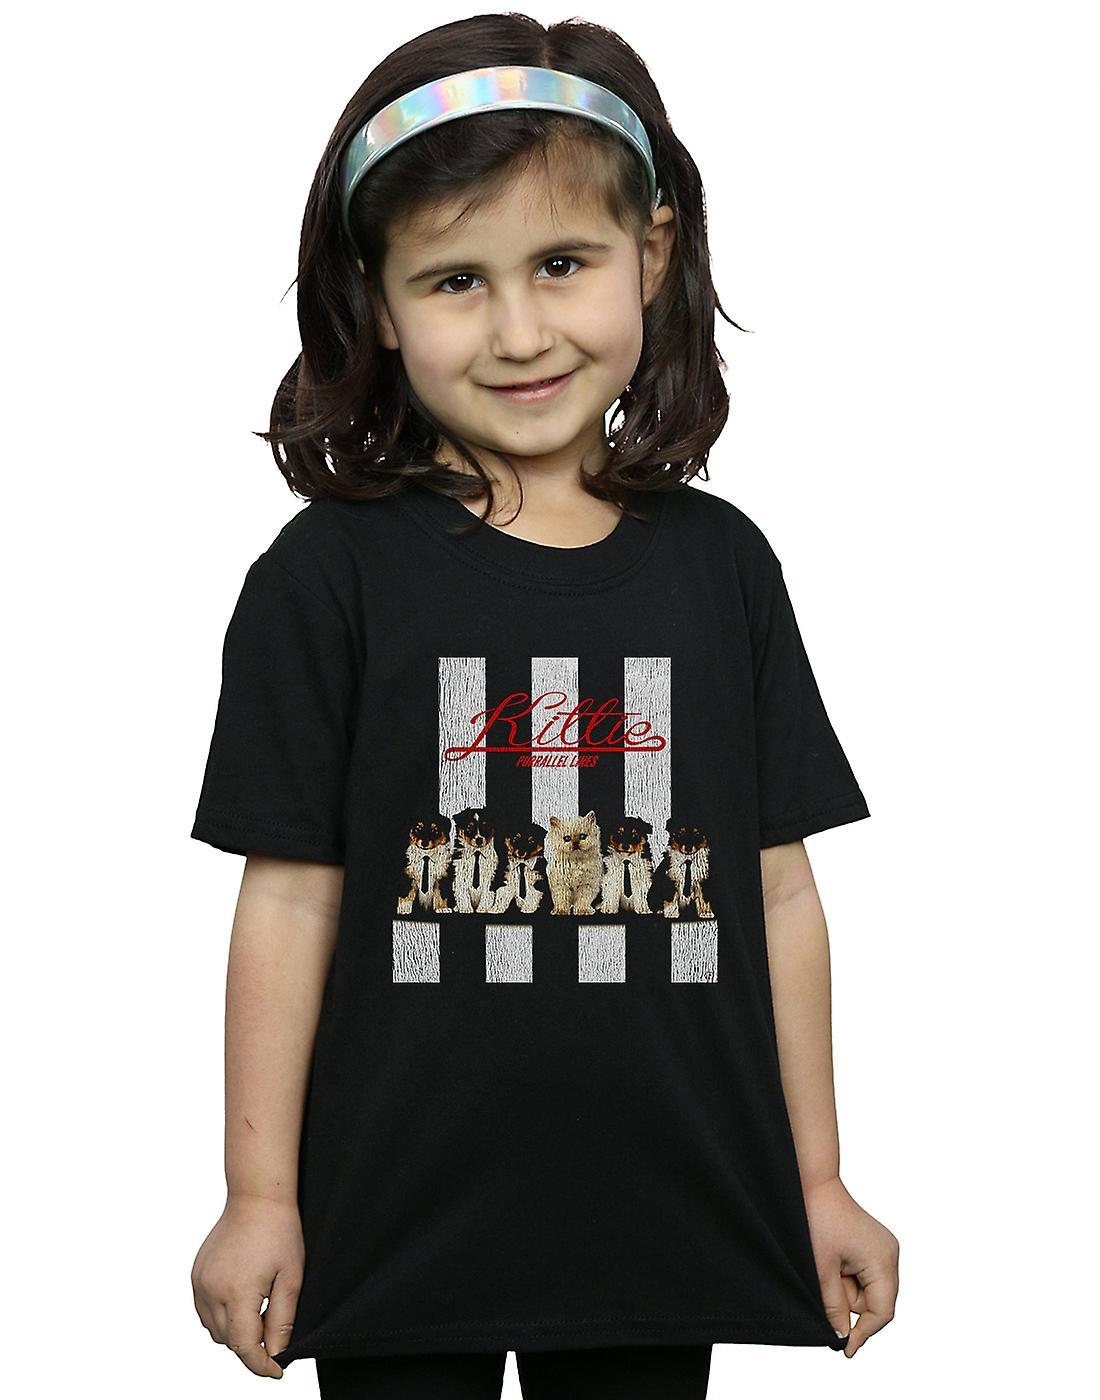 Blondie Girls Kitty Purrallel Lines T-Shirt